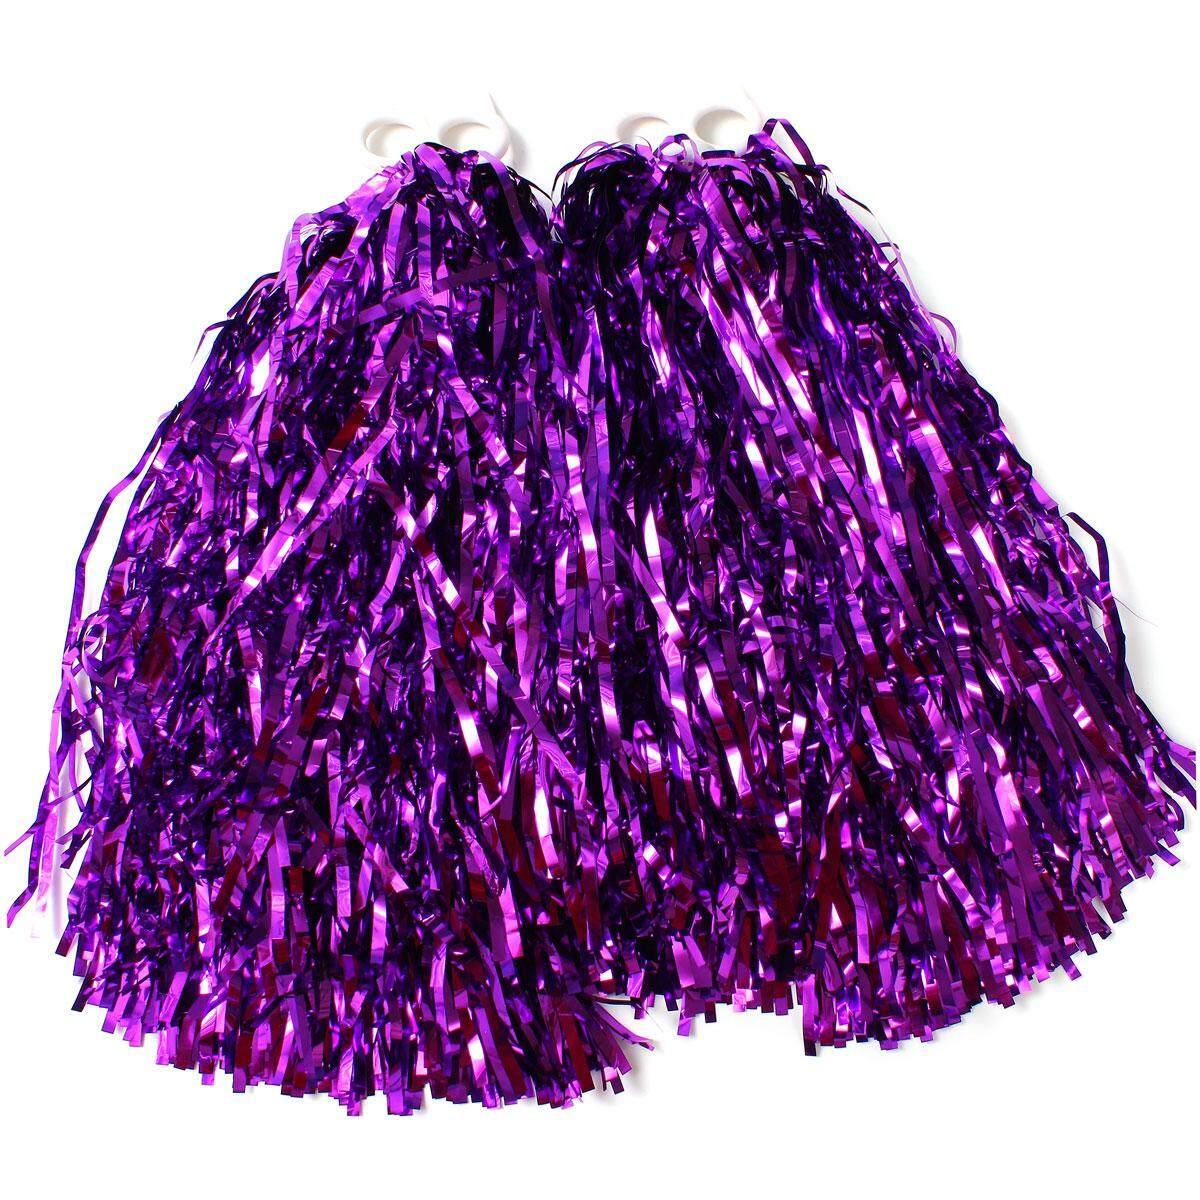 4 Sizes DIY Pompom Maker Fluff Ball Weaver Needle Craft Knitting Source · 10pcs lot Cheerleading Lalla Ball Pom Poms Cheerleaders Props Pompom 20g to 200g ...